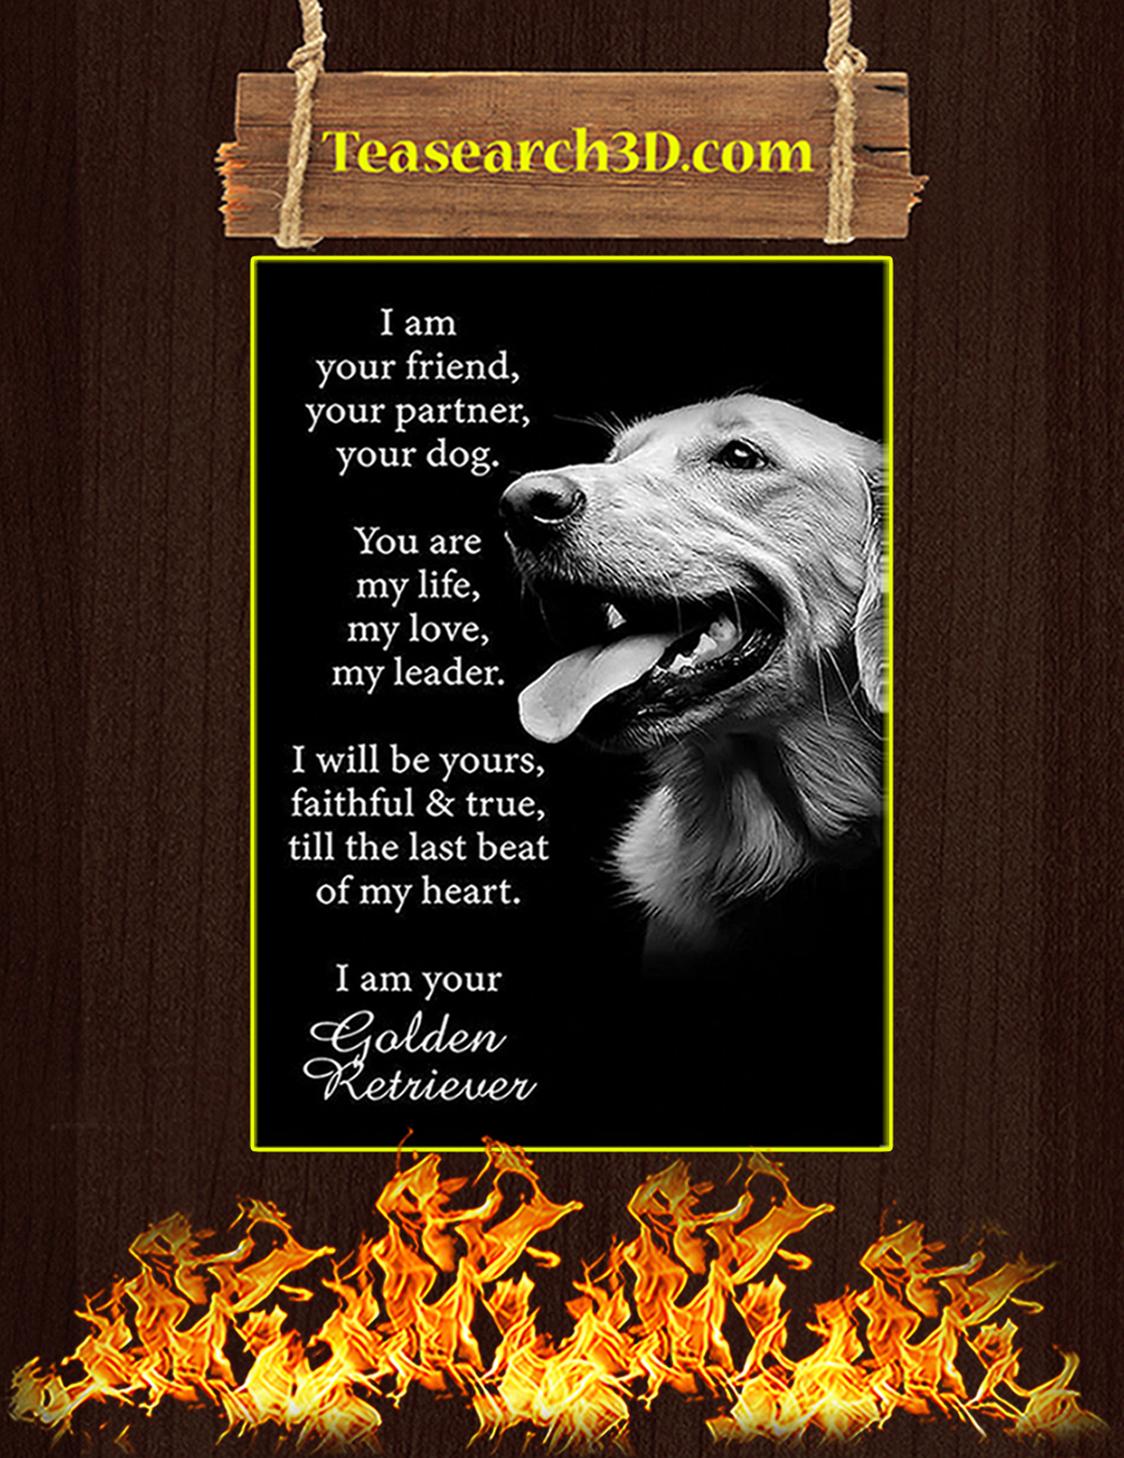 Golden retriever I am your friend your partner your dog poster A3